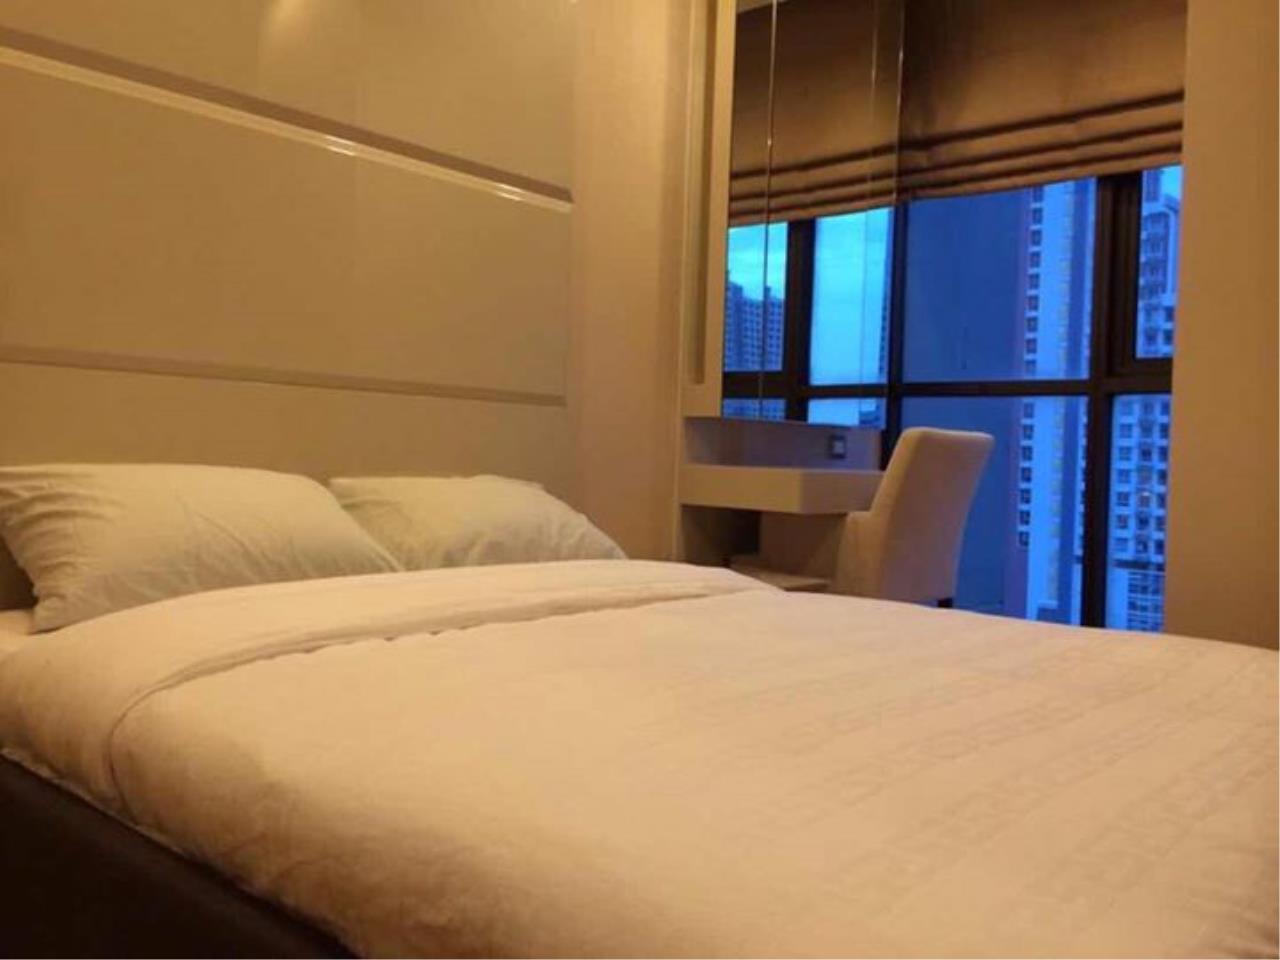 Century21 Skylux Agency's The Address Sathorn / Condo For Sale / 2 Bedroom / 66 SQM / BTS Chong Nonsi / Bangkok 4